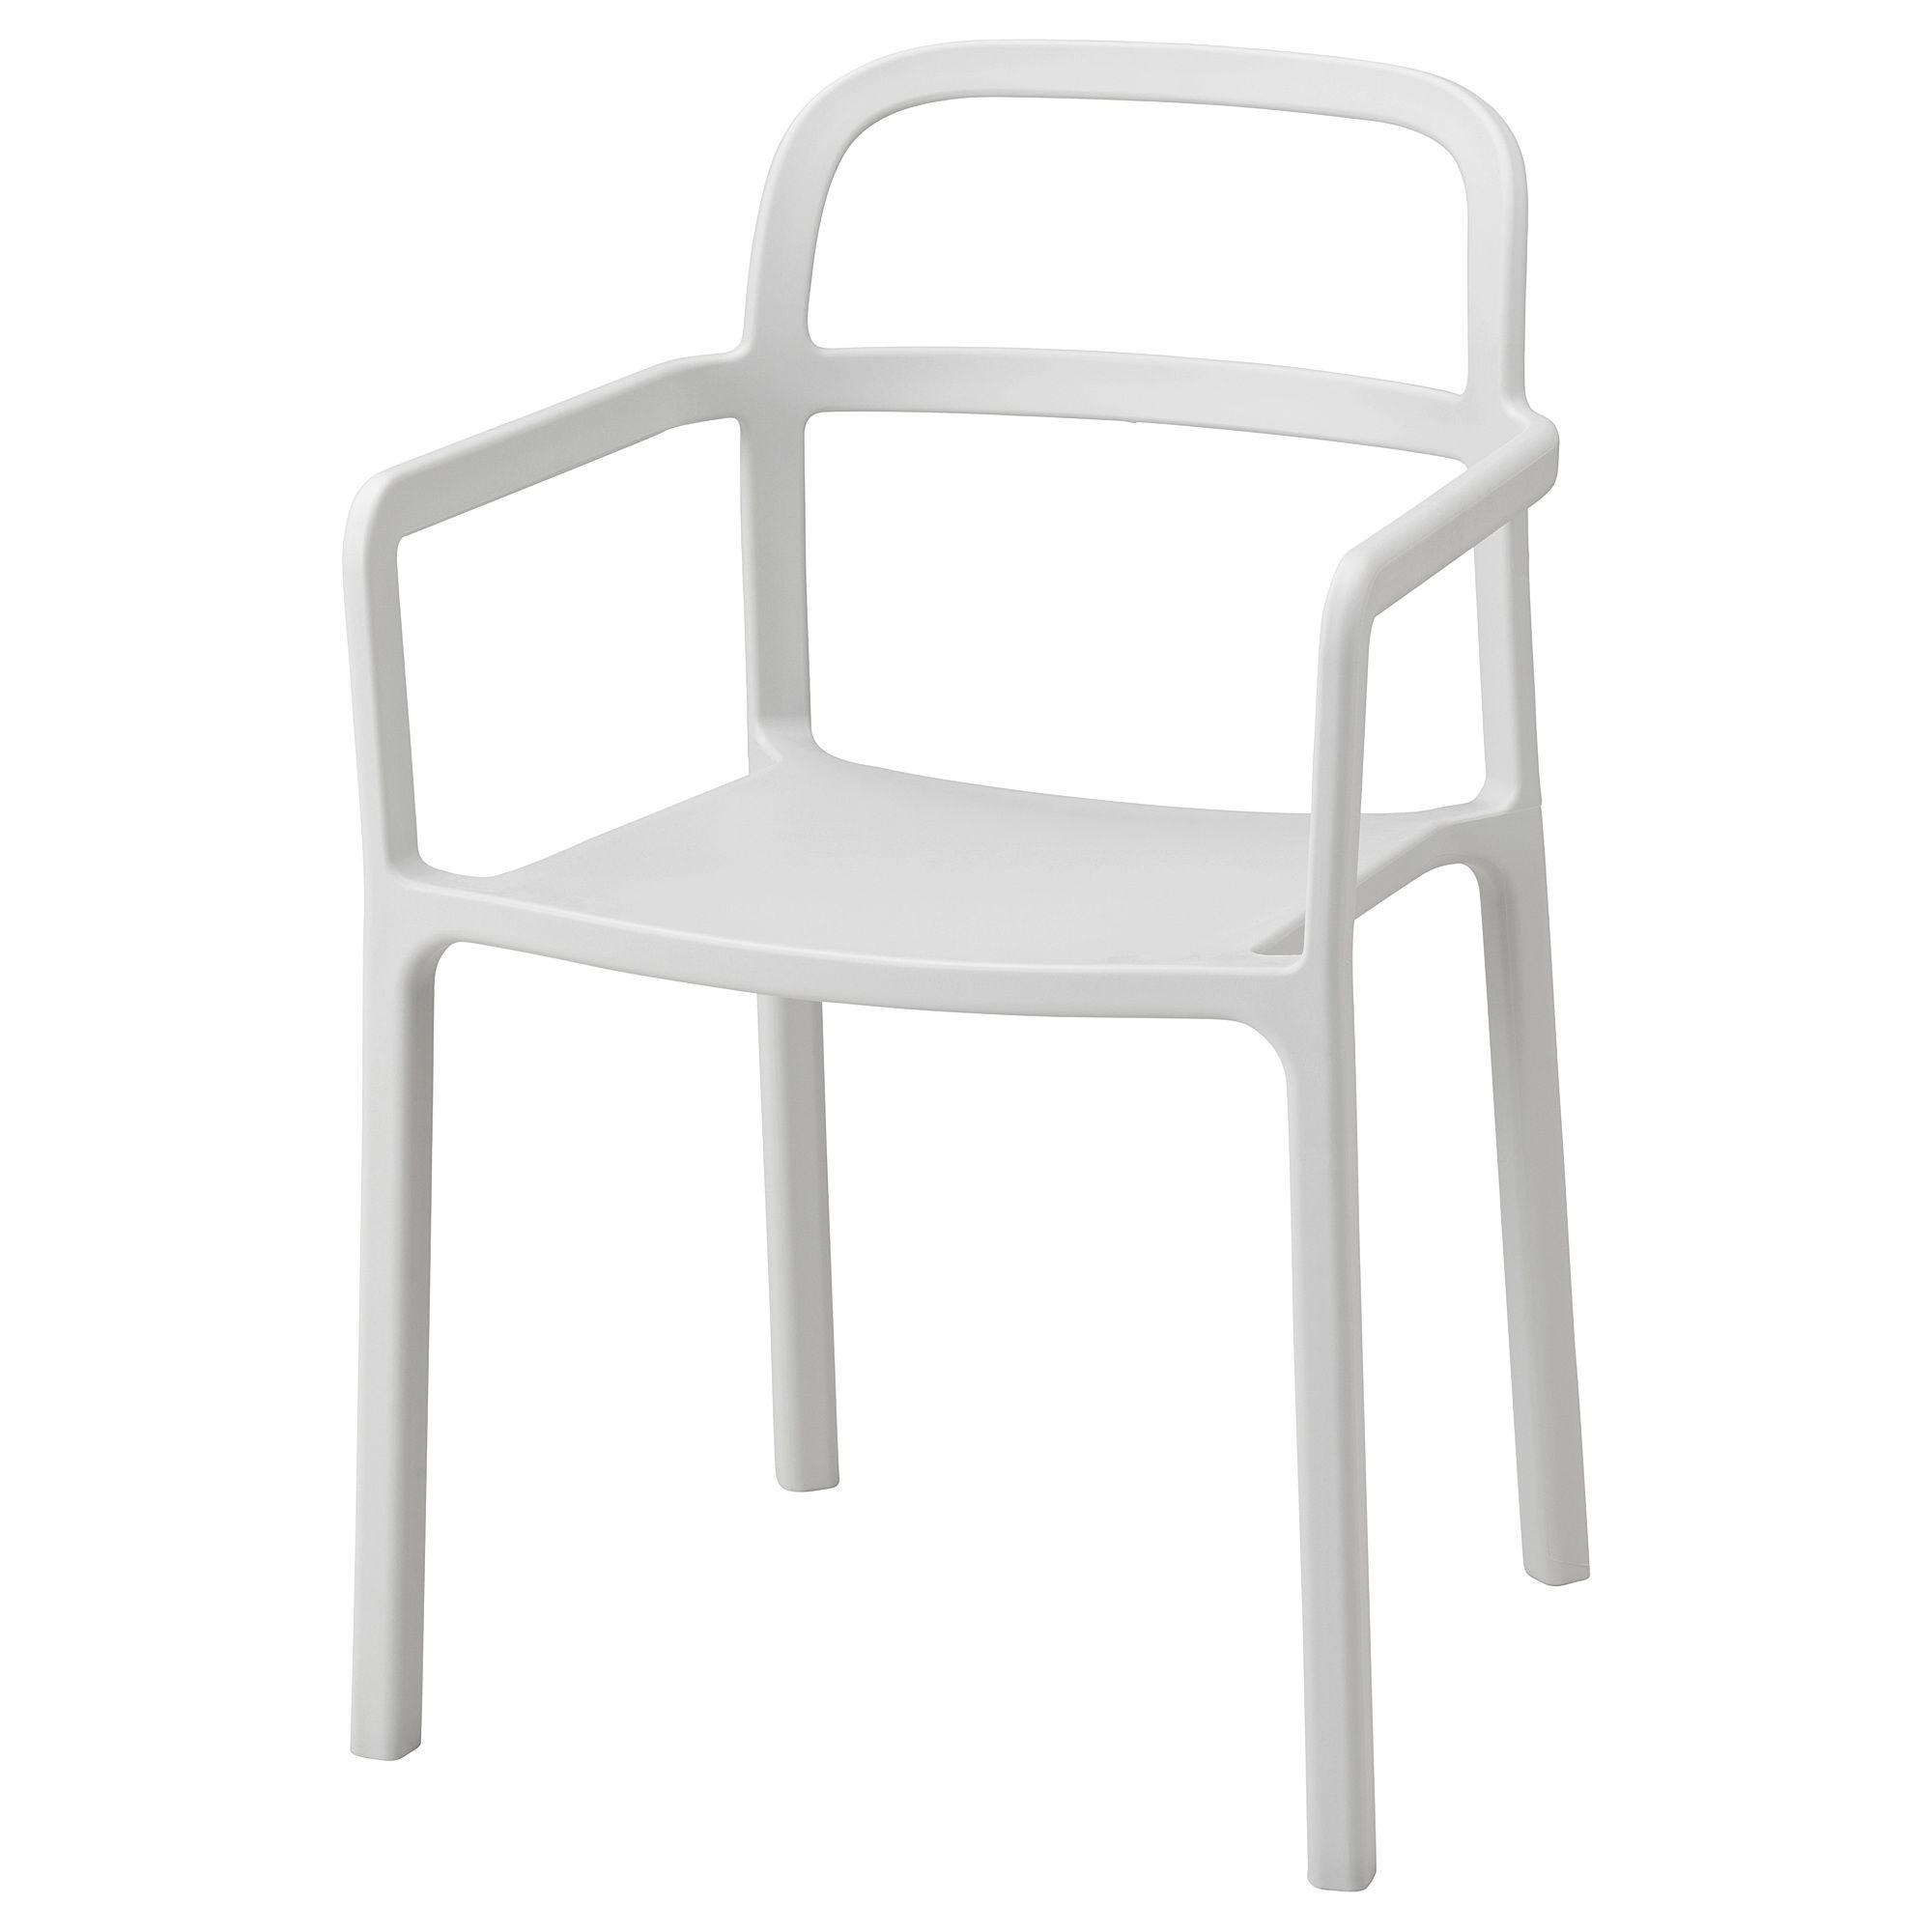 Ikea Gartenstuhl Plastik